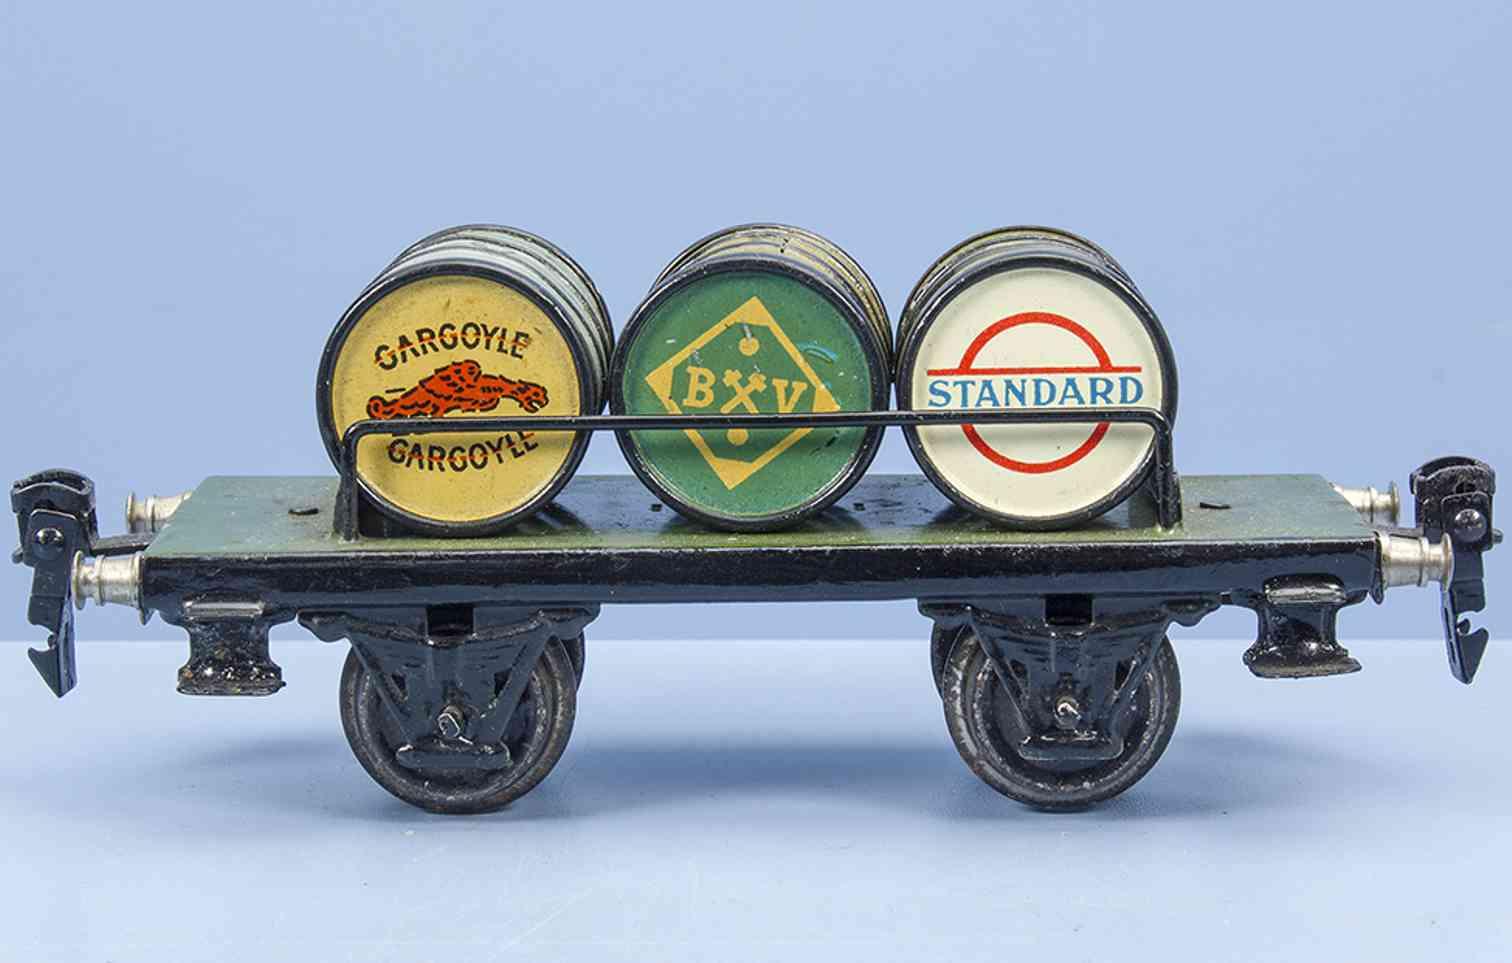 marklin maerklin 1999/0 (1932) railway toy barrel car 3 barrels gauge 0